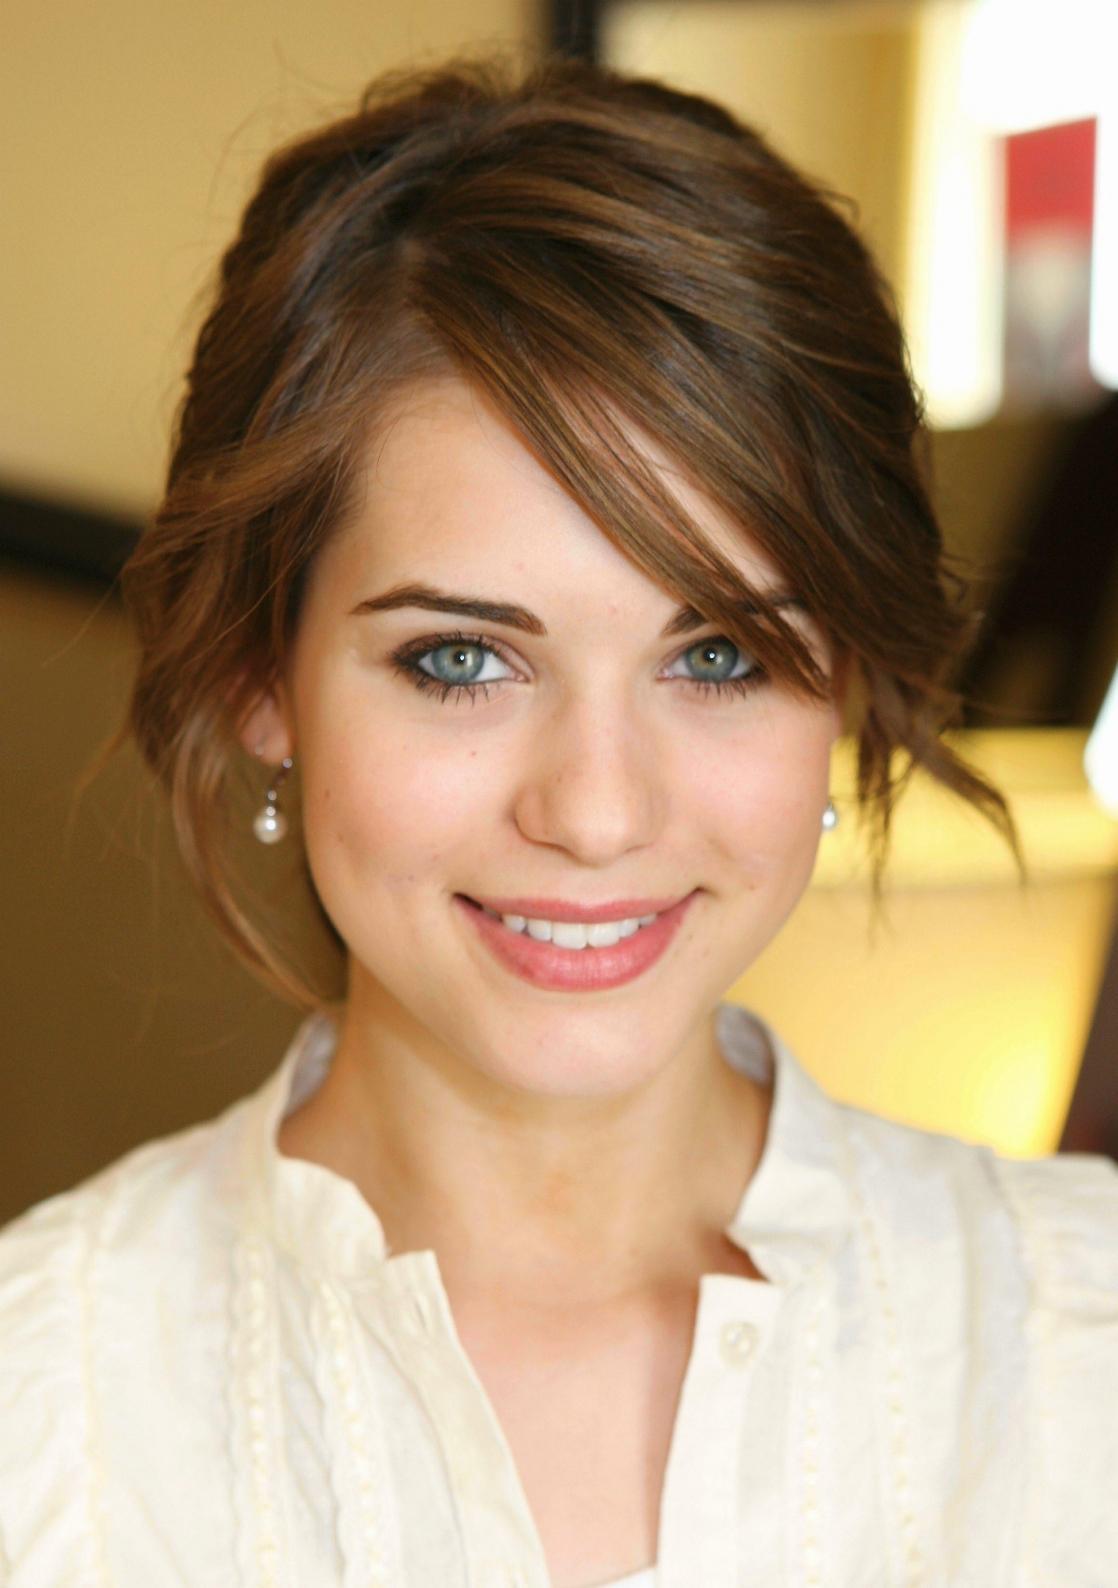 Beautiful Woman Smiles At You.jpg